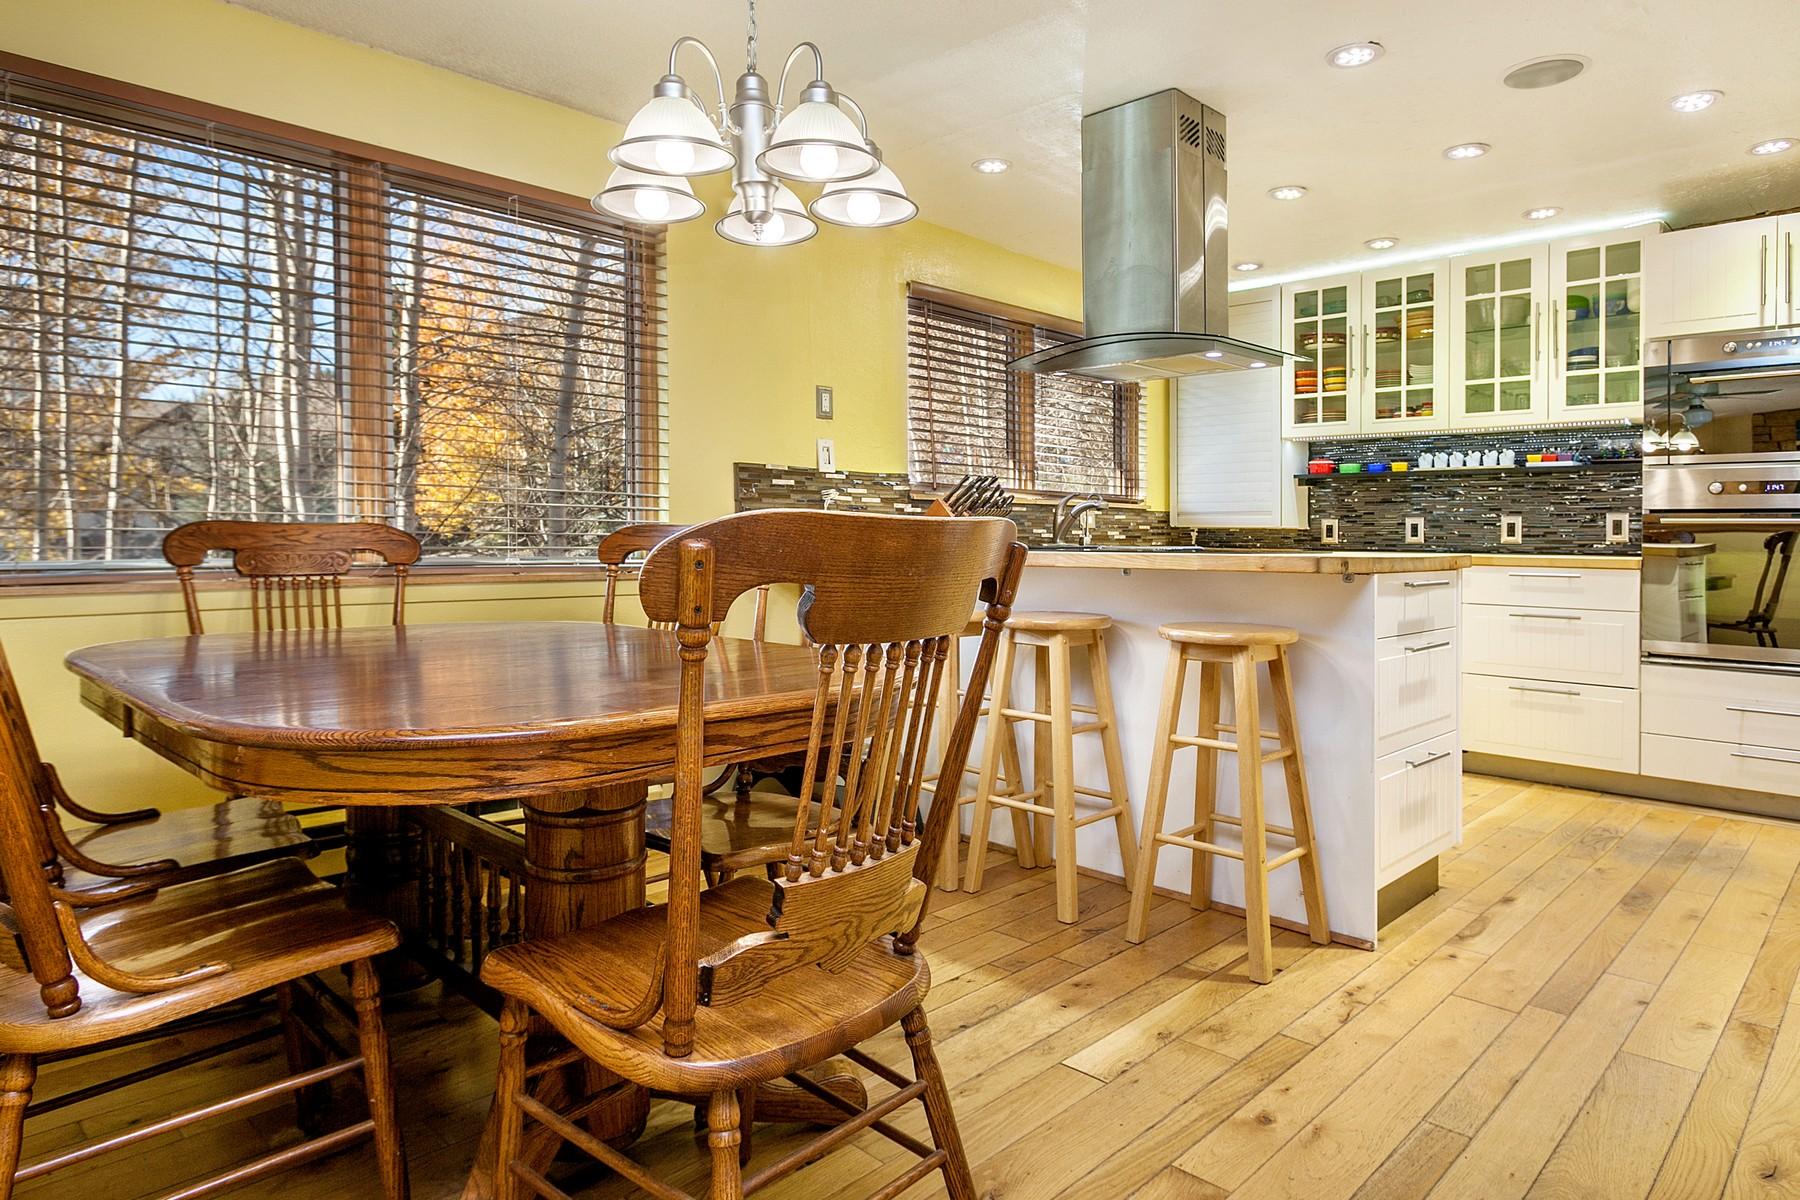 Single Family Home for Sale at 2844 Garmisch Dr. 2488 Garmisch Dr Vail, Colorado, 81657 United States